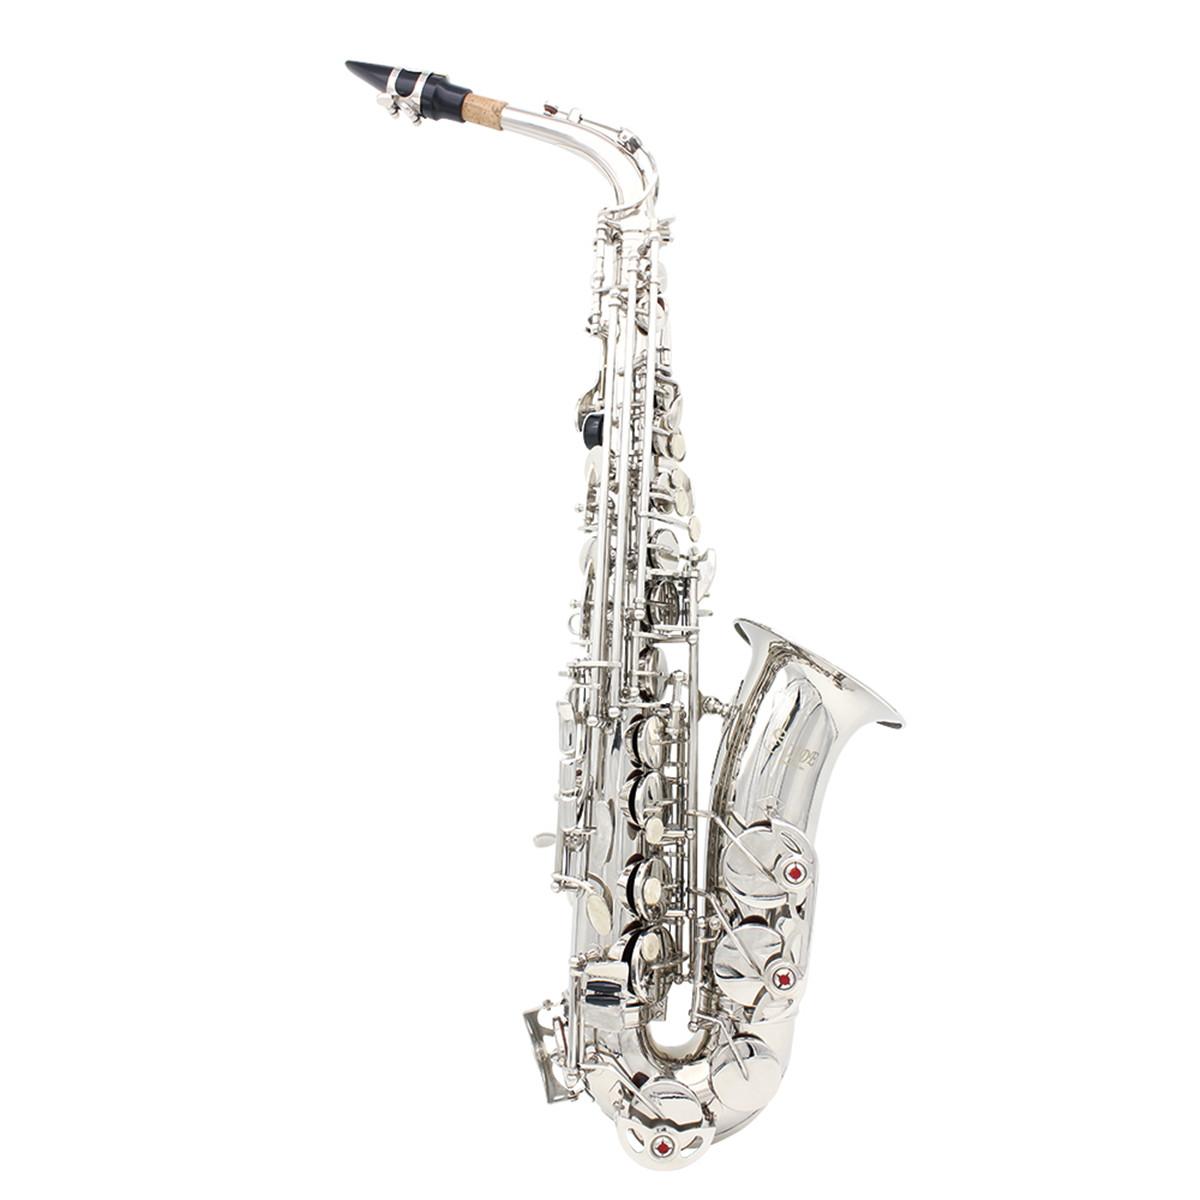 SLADE LD-896 E-flat Brass Pipe Alto Saxophone with Bag